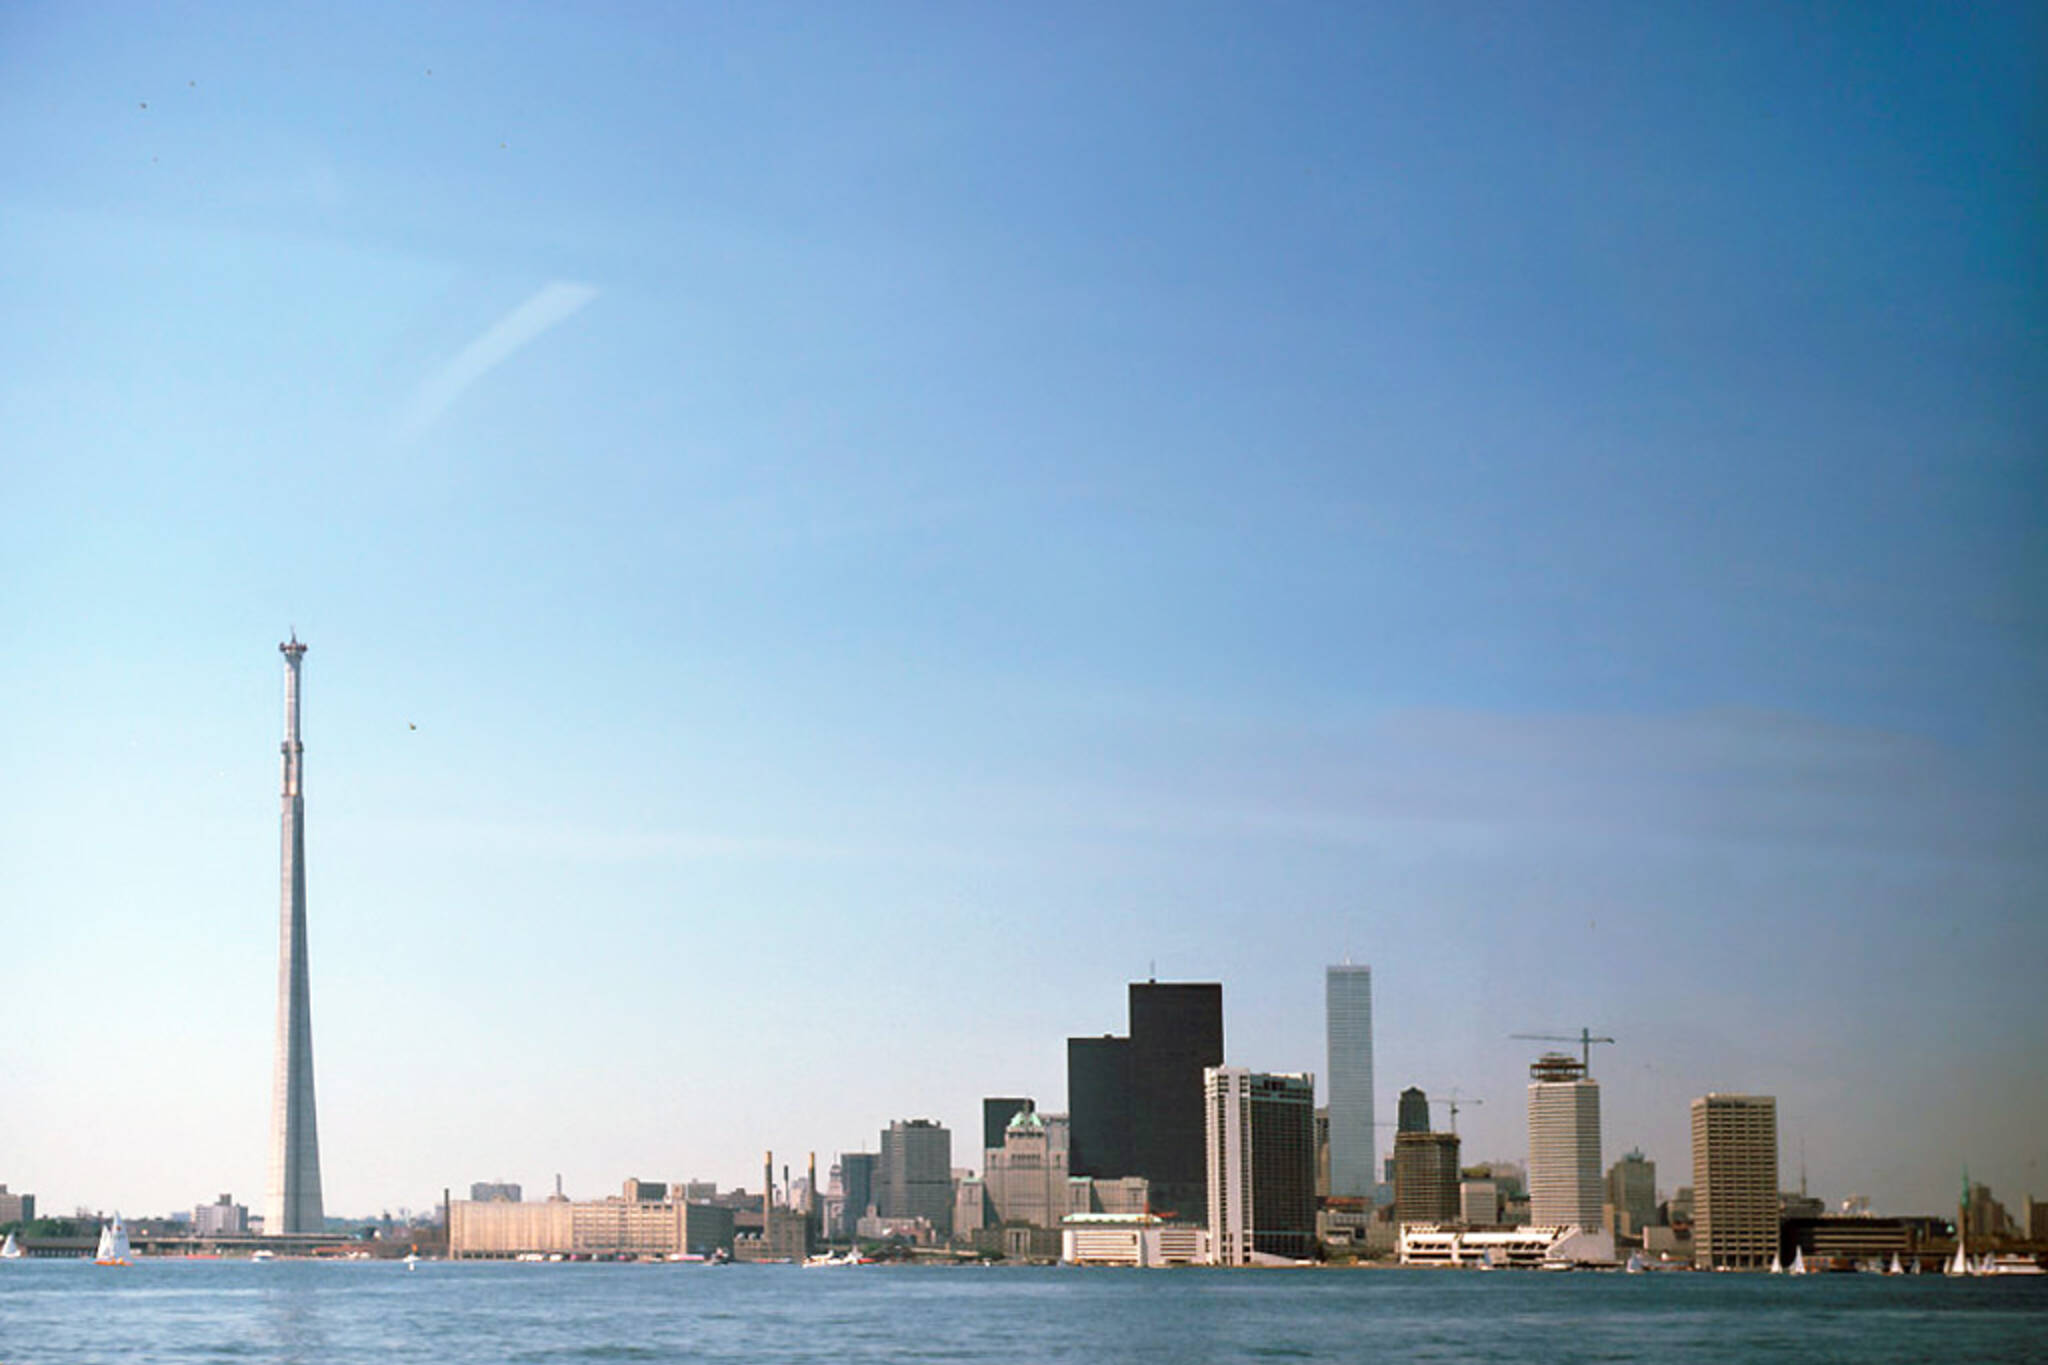 Toronto skyline transformation